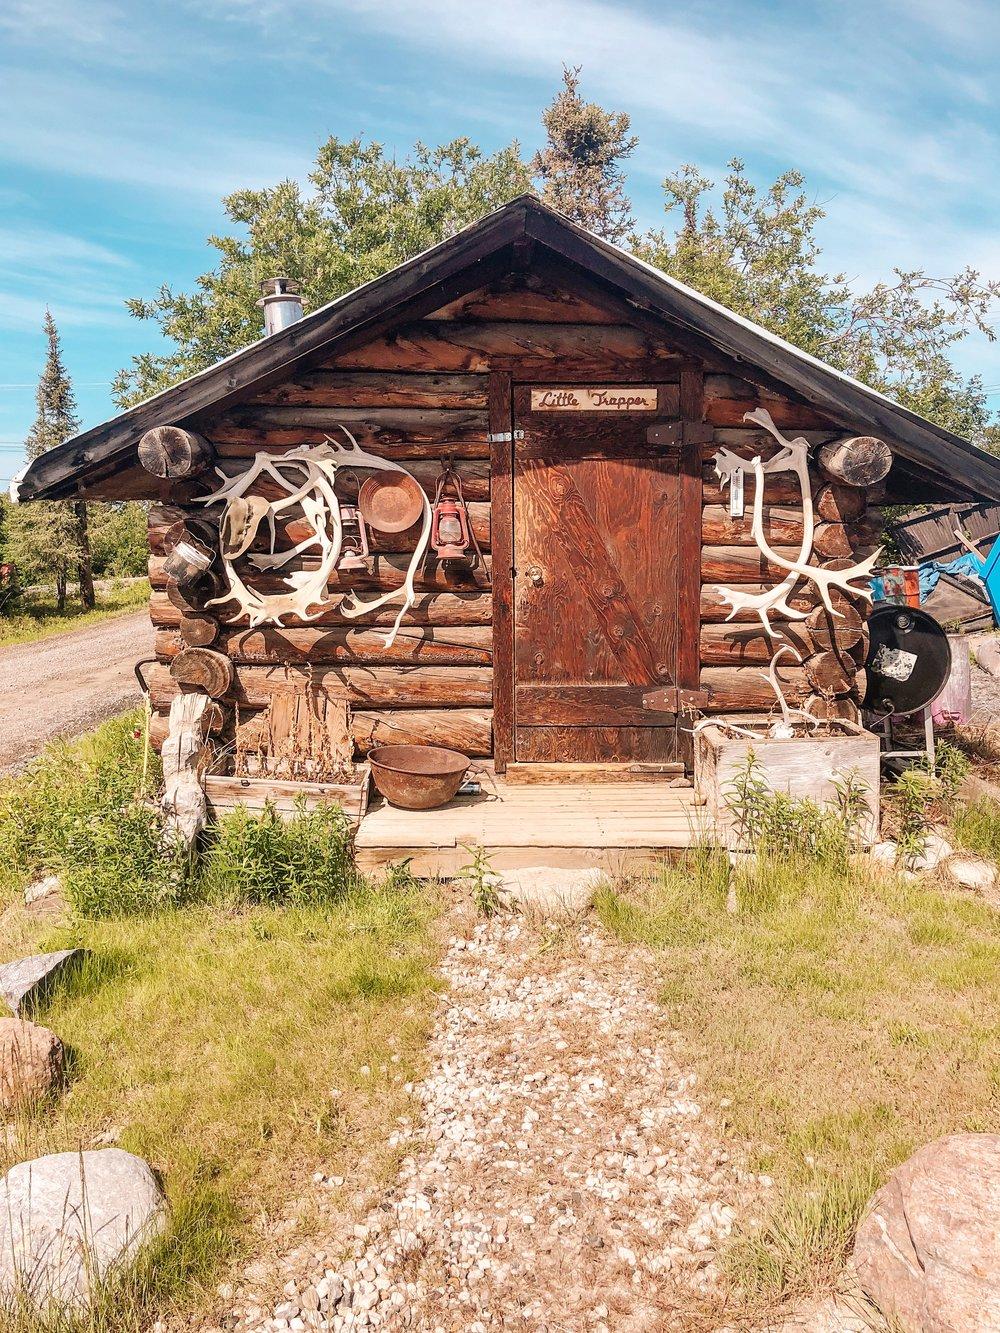 Trapper cabin in Inuvik, NWT Canada's arctic